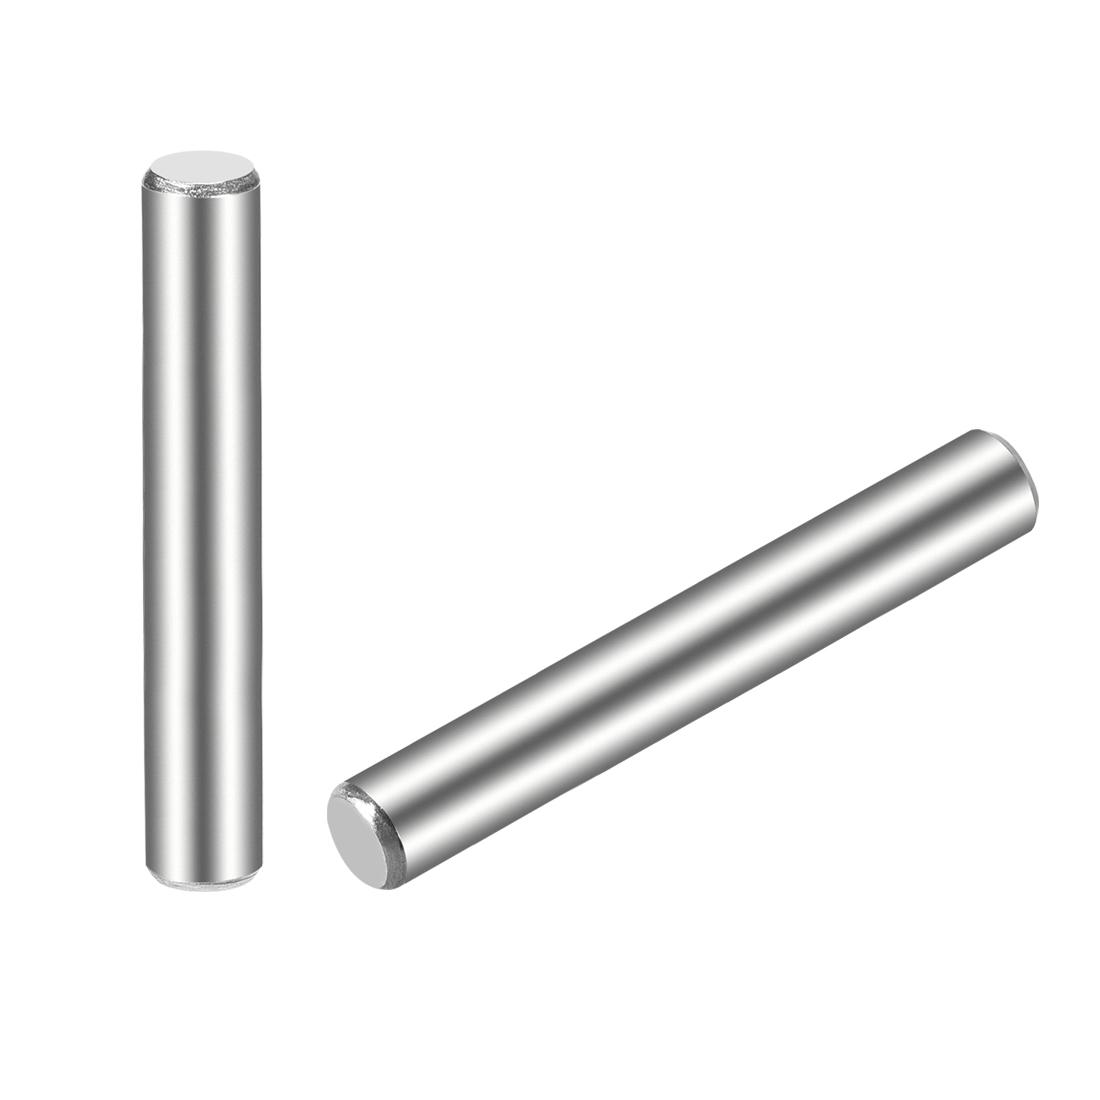 25Pcs 5mm x 45mm Dowel Pin 304 Stainless Steel Shelf Support Pin Fasten